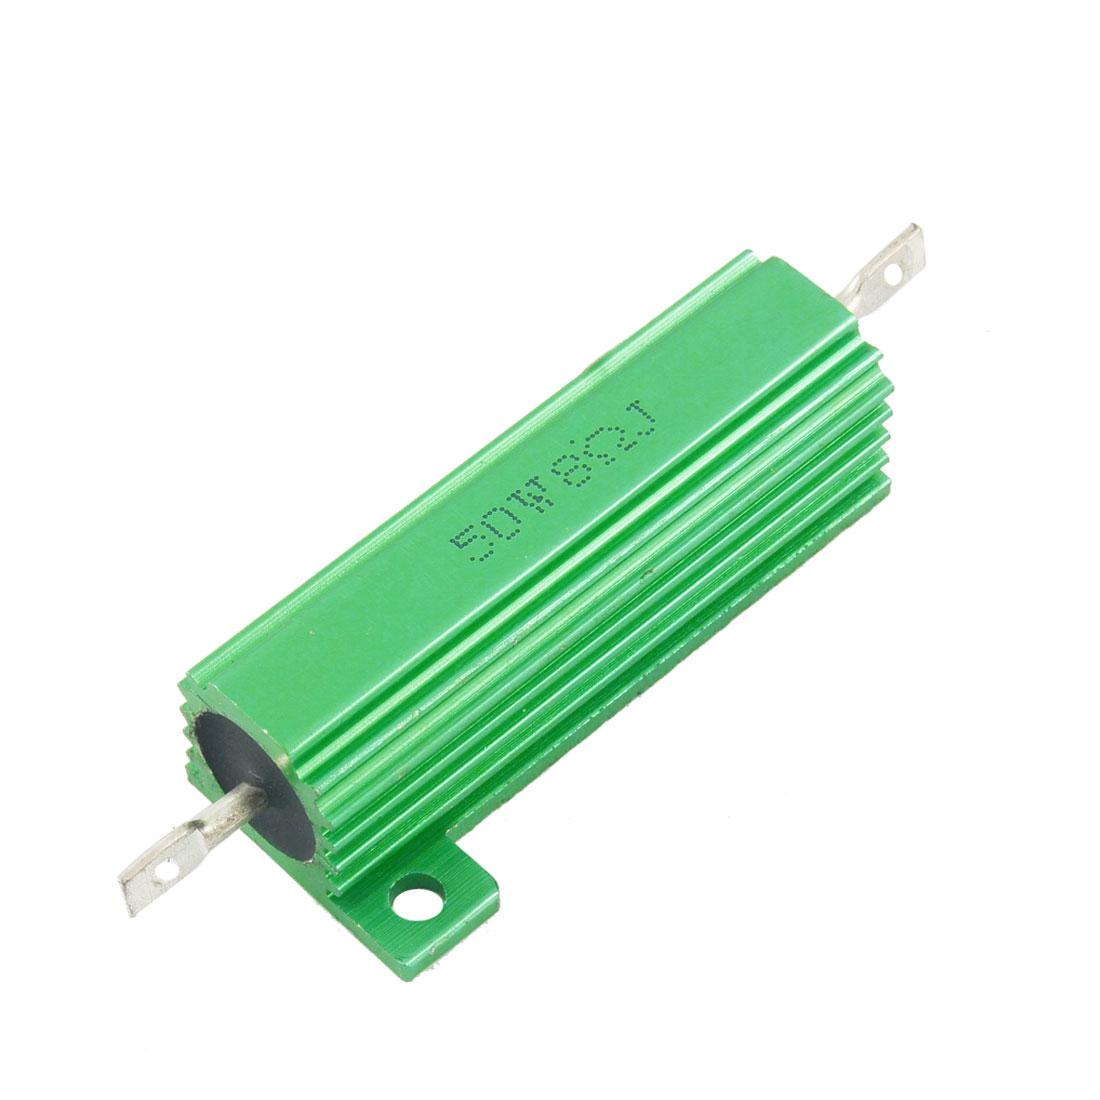 50 Watt 8 Ohm 5% Green Aluminum Shell Wire Wound Resistor